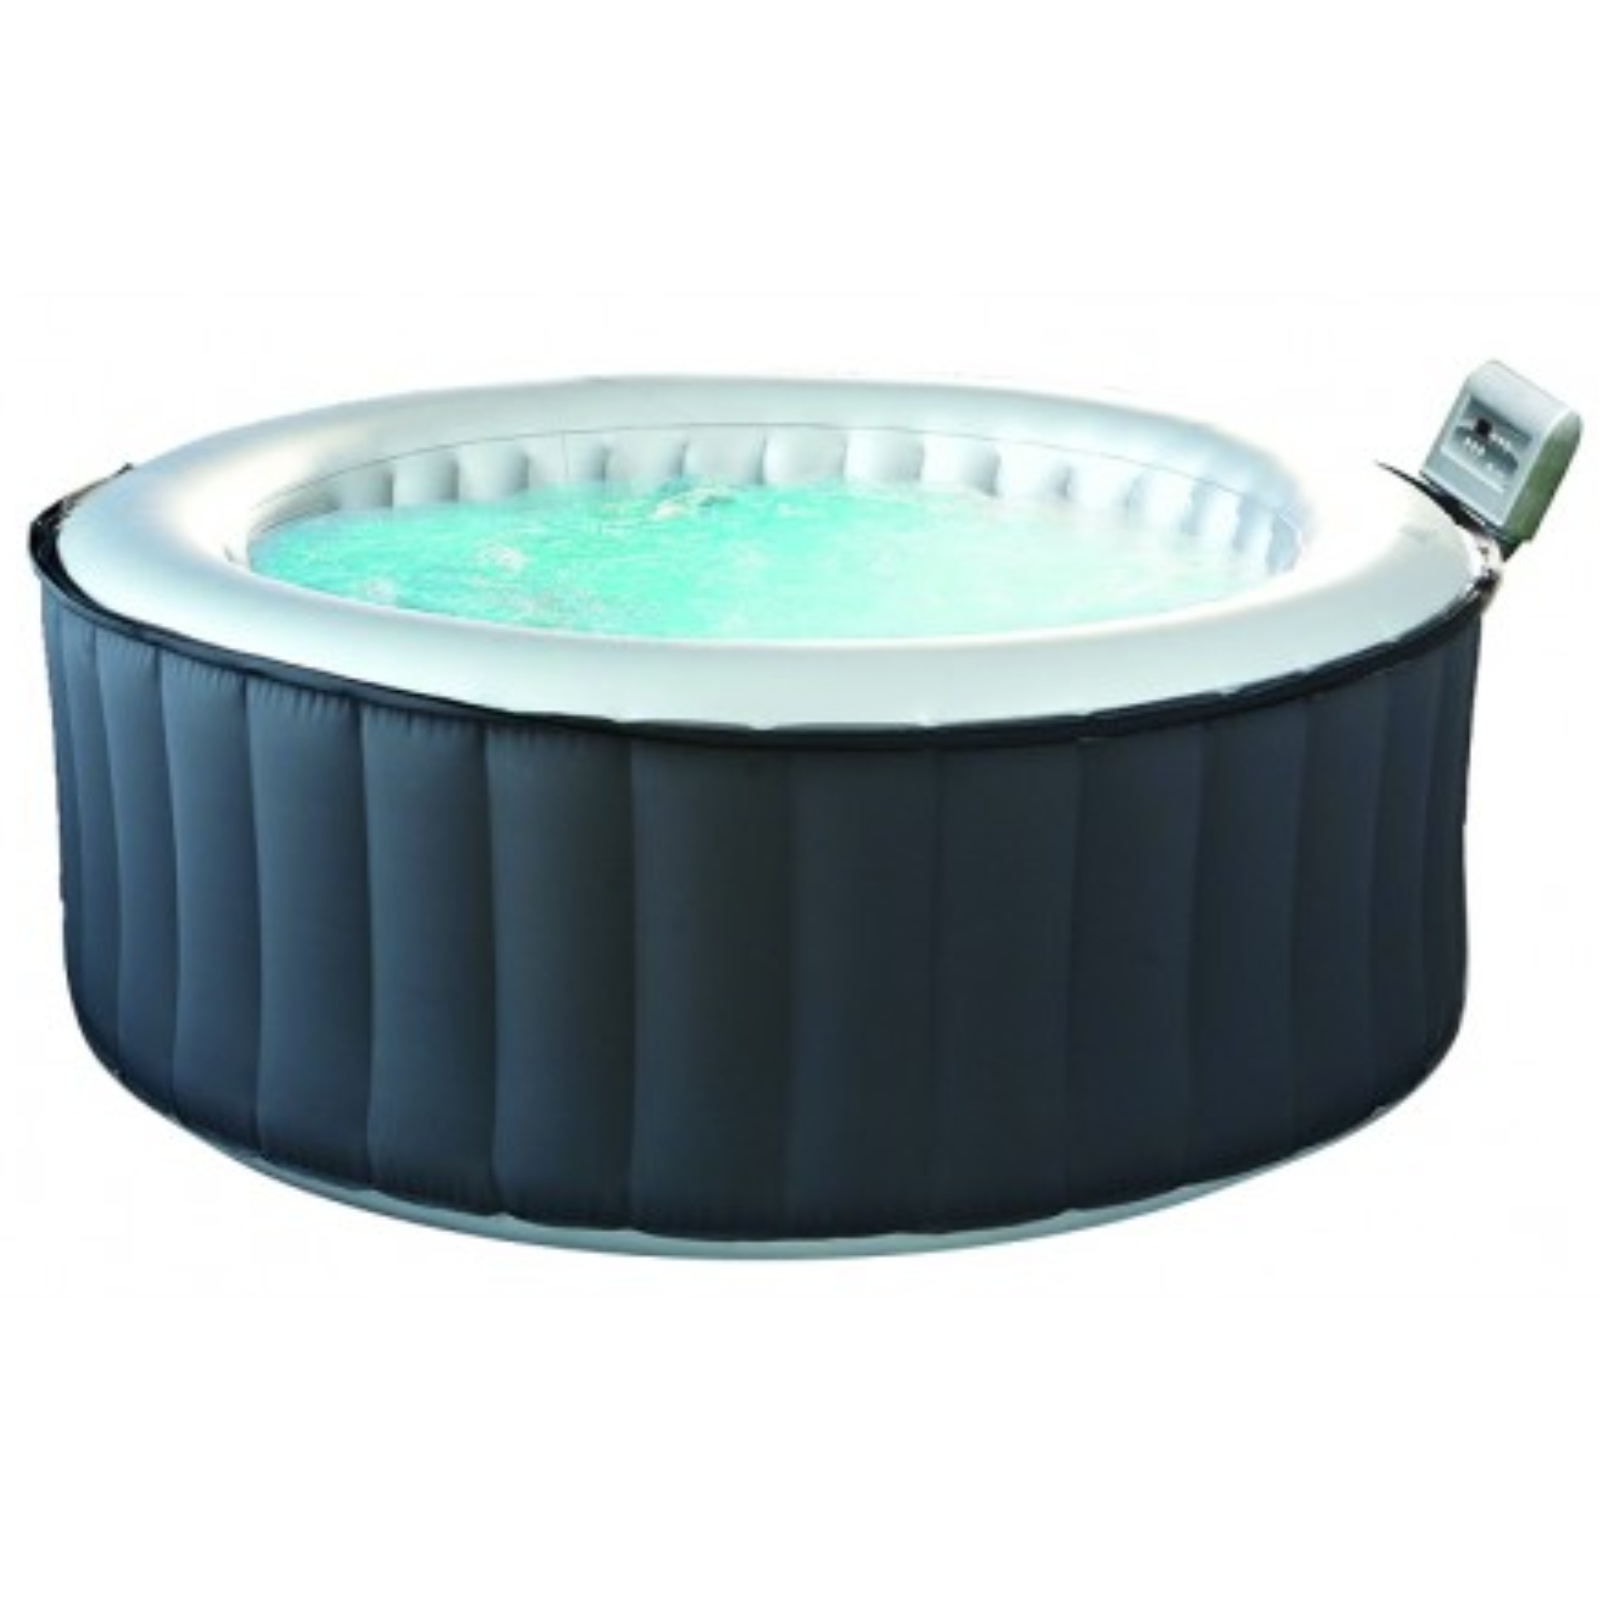 Vířivý bazén HANSCRAFT MSpa Silver Cloud M-011LS LITE